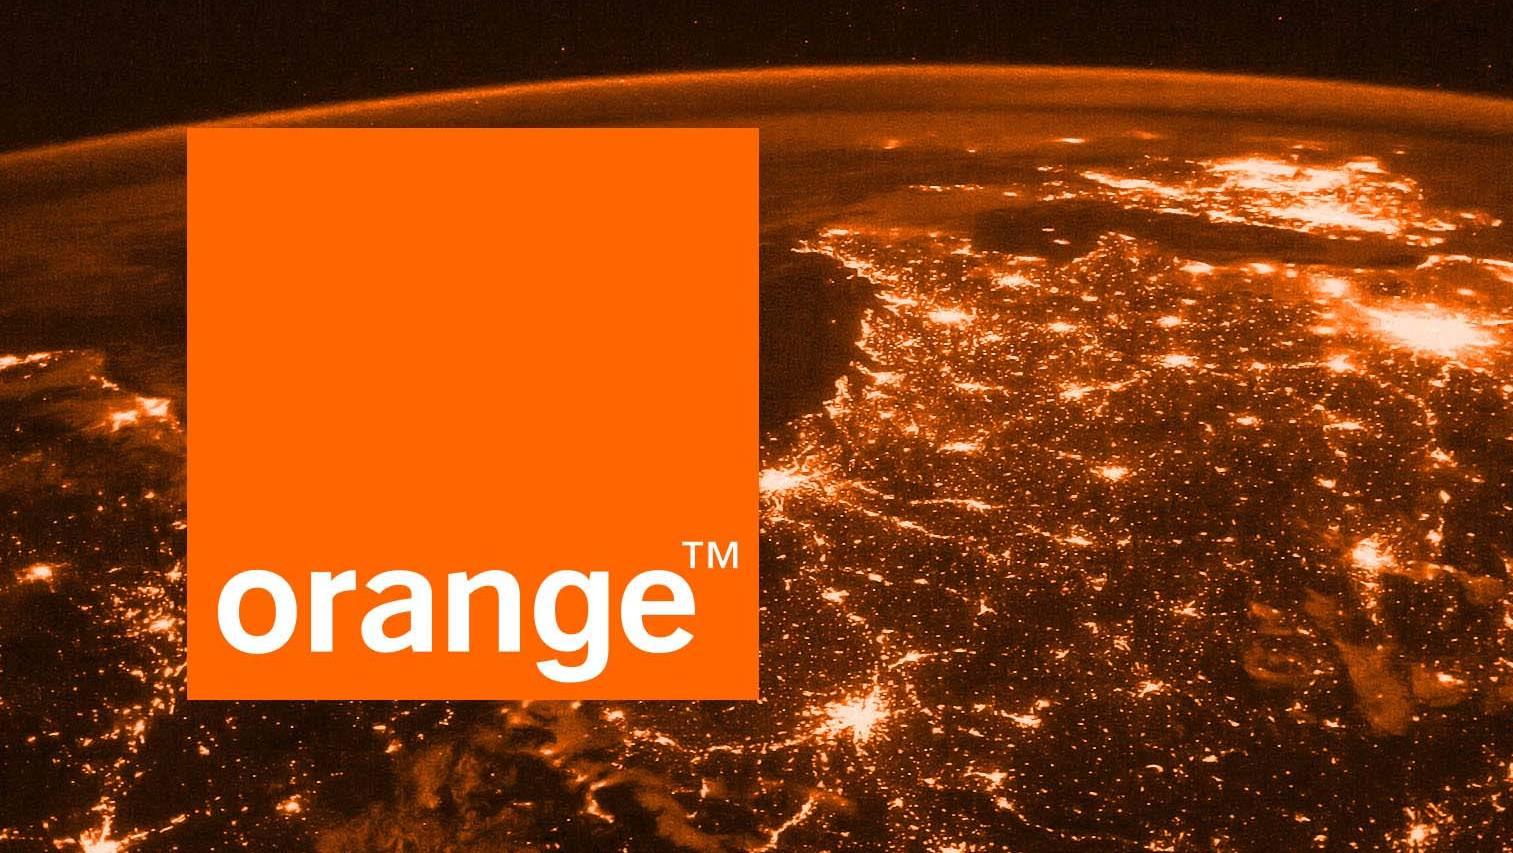 orange romania oferte excelente telefoane profiti